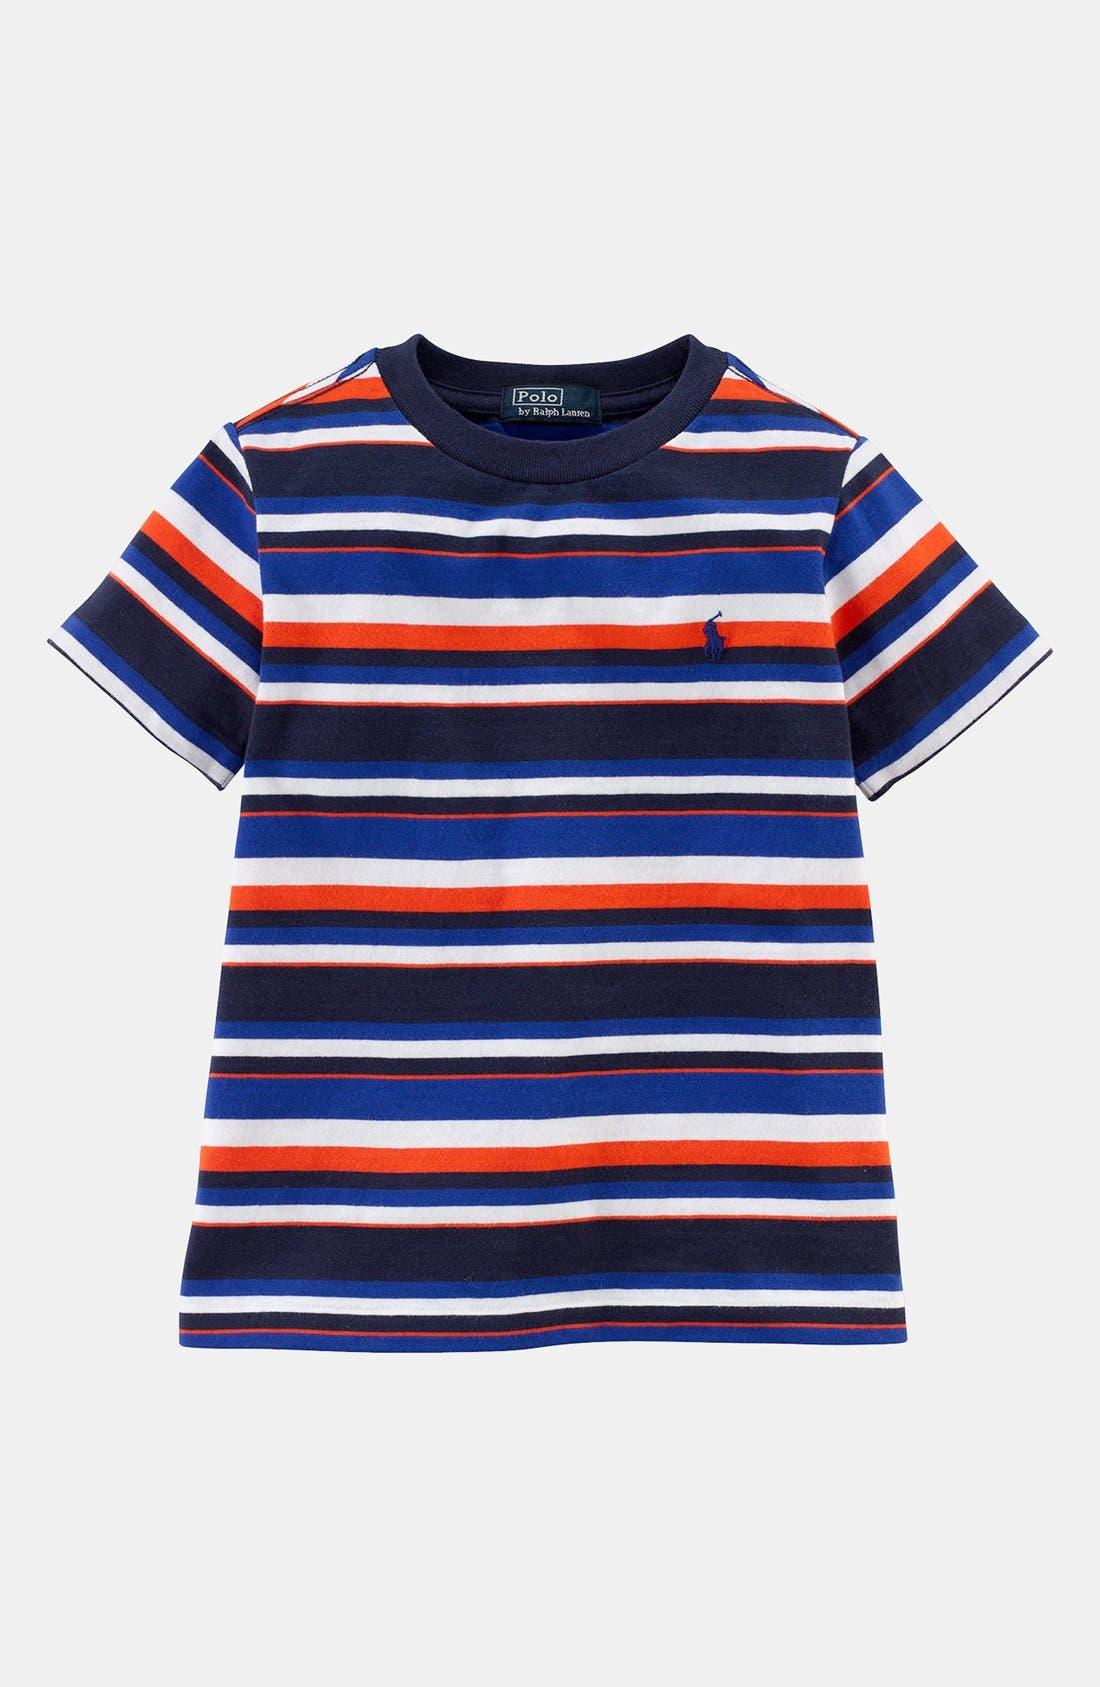 Main Image - Ralph Lauren Stripe T-Shirt (Toddler Boys)